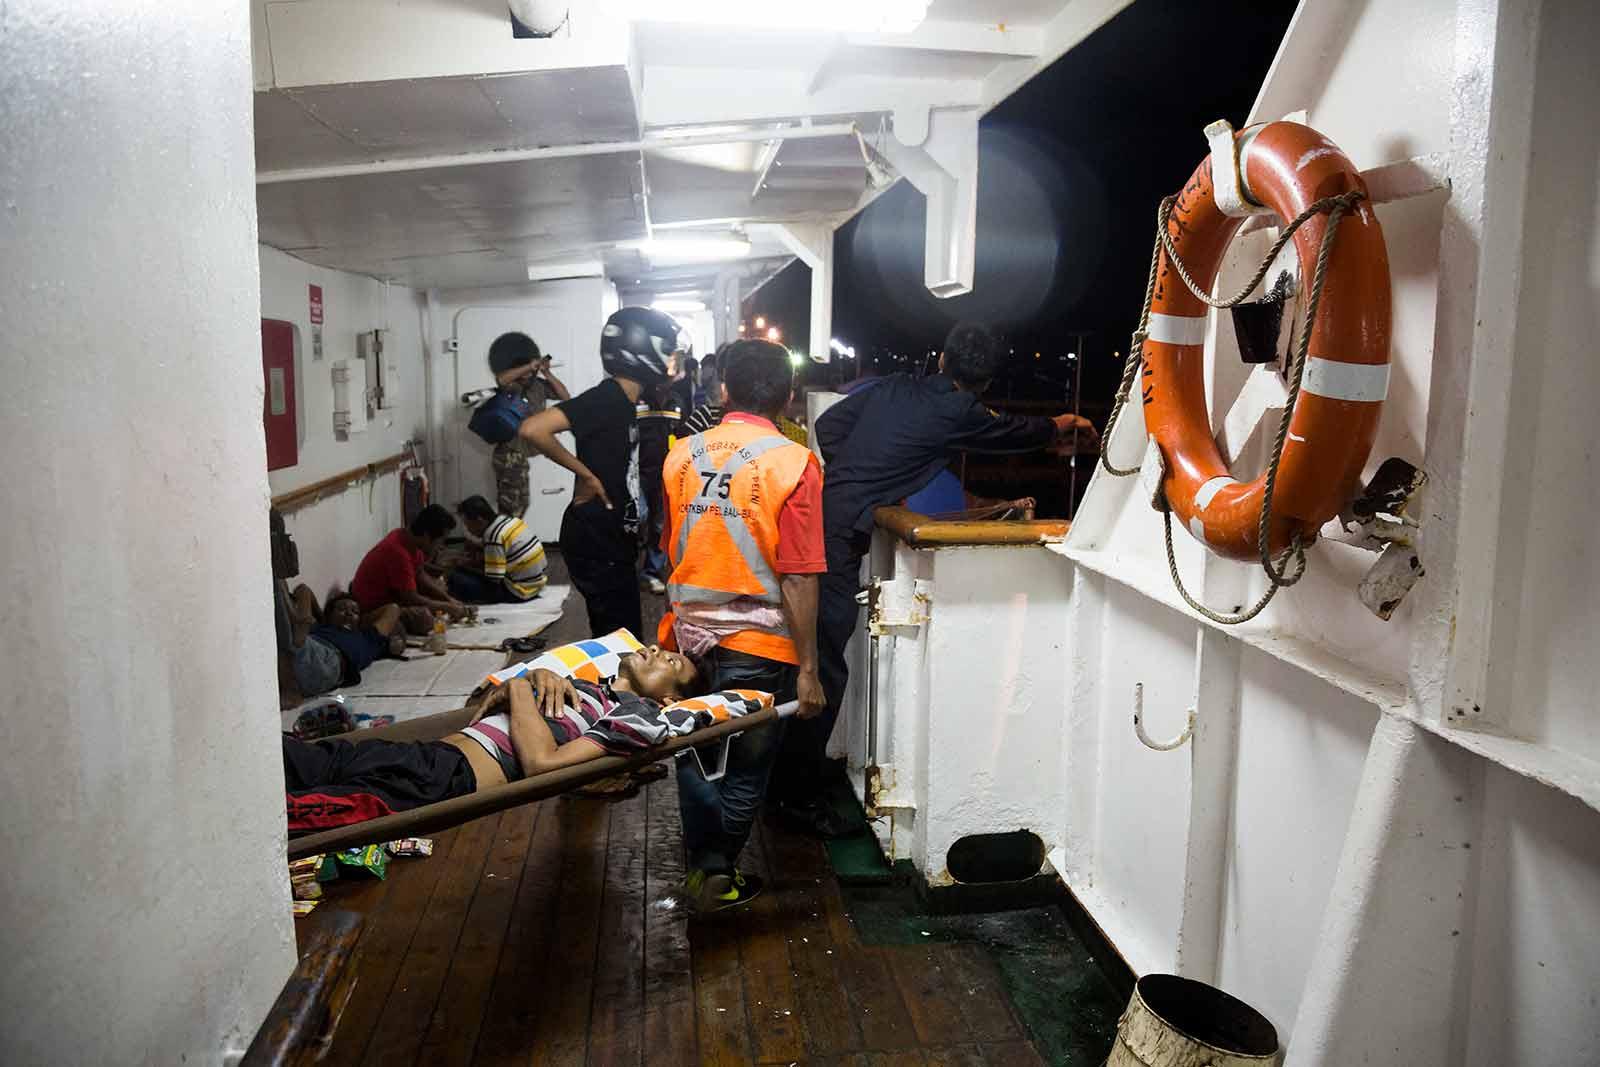 Maluku Islands: Just your average scene abord a Pelni ship in Indonesia.